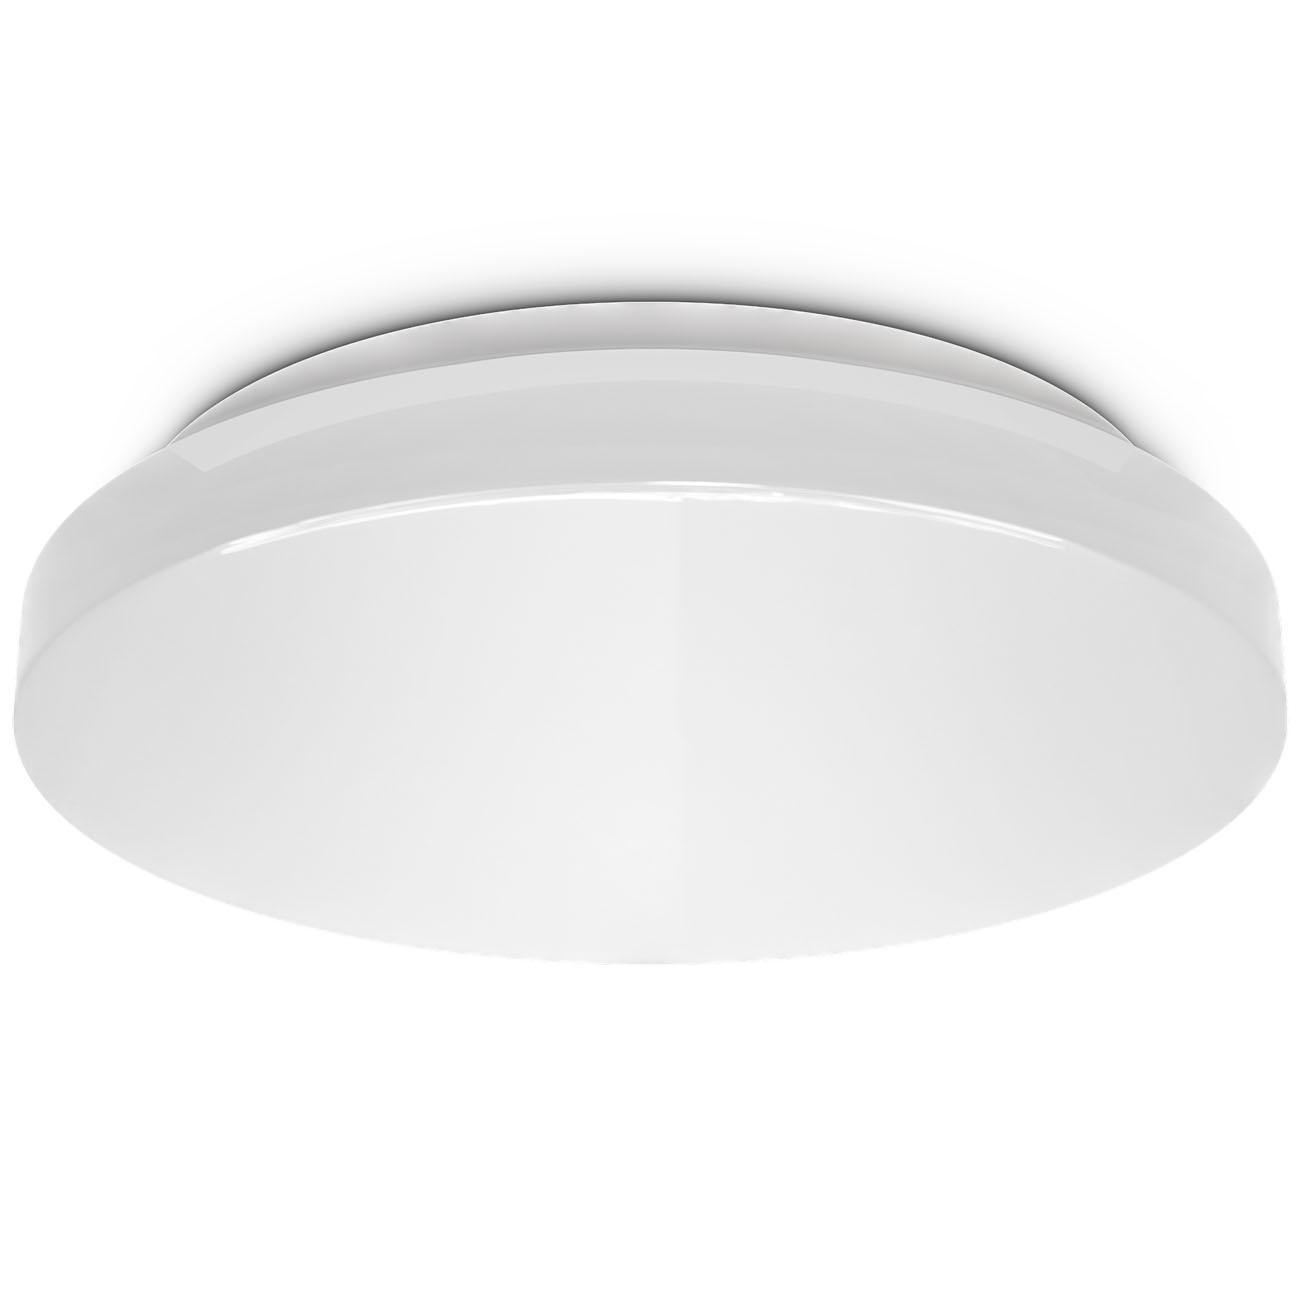 LED Deckenleuchte Badlampe IP44 L